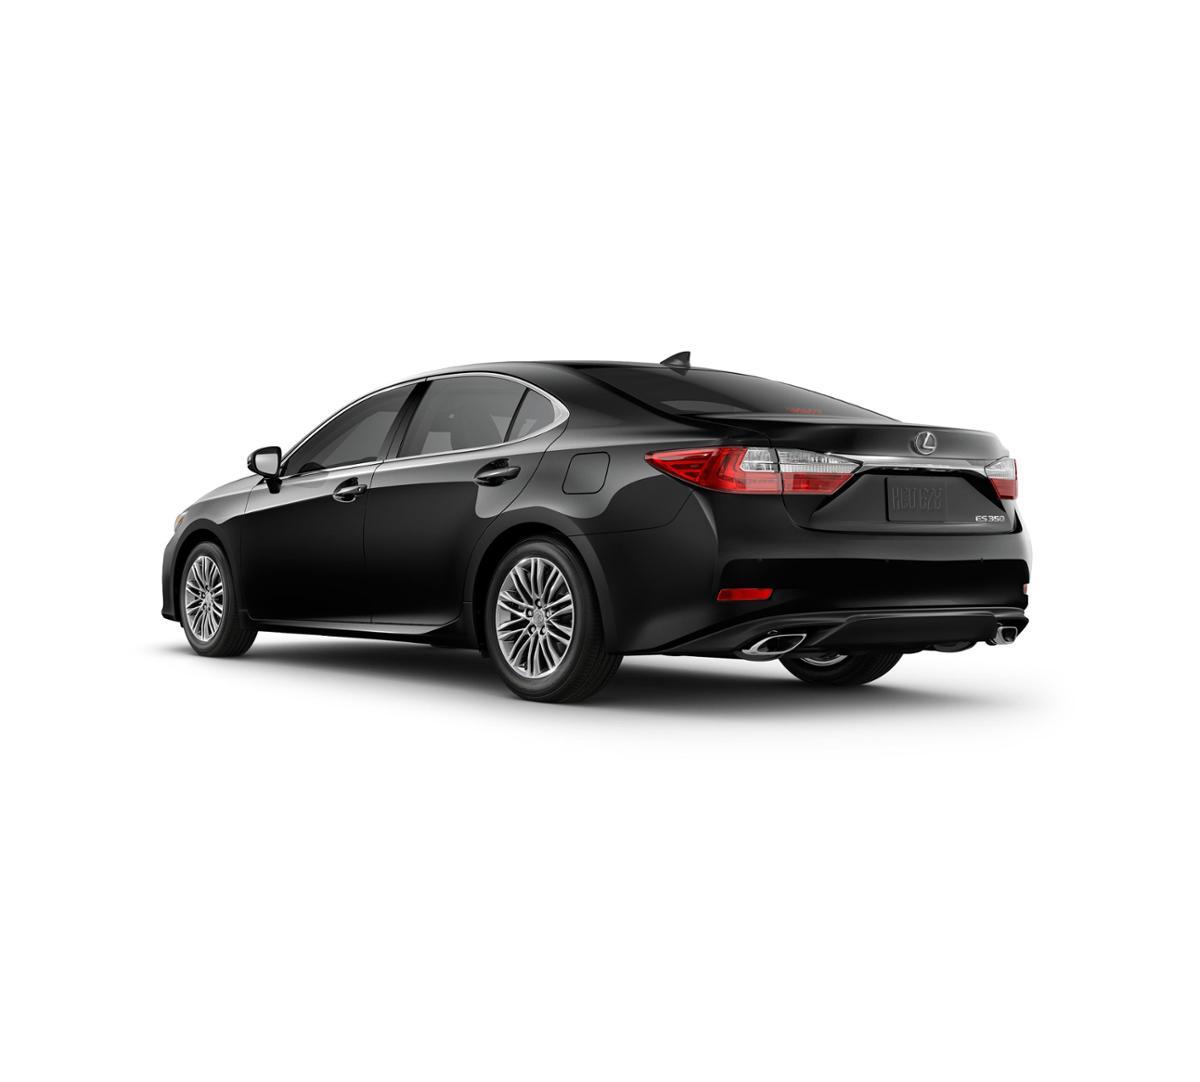 2017 Lexus ES 350 For Sale In Bossier City